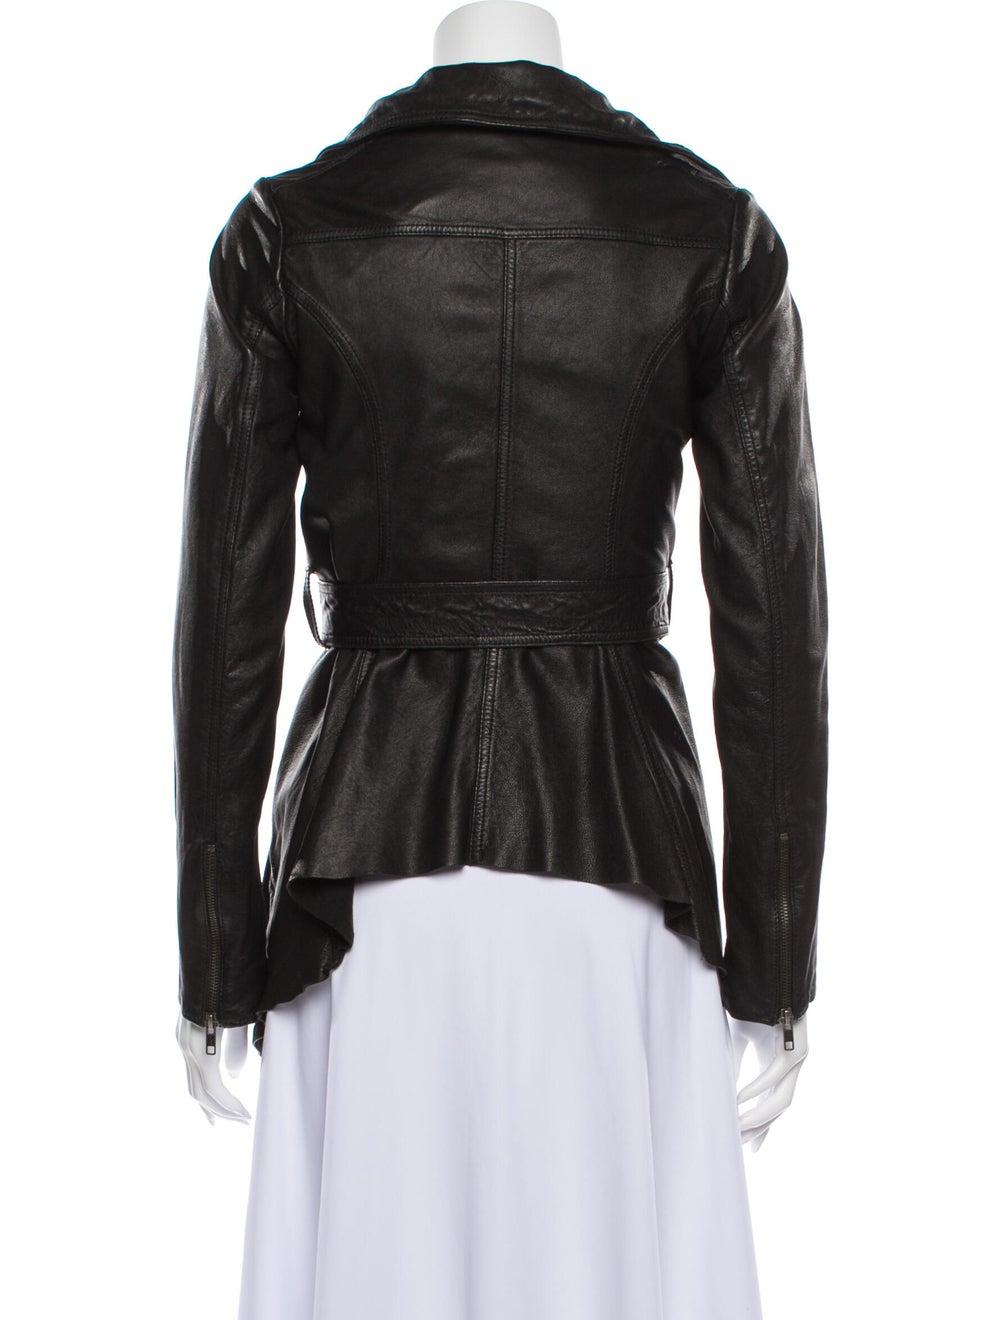 AllSaints Leather Evening Jacket Black - image 3